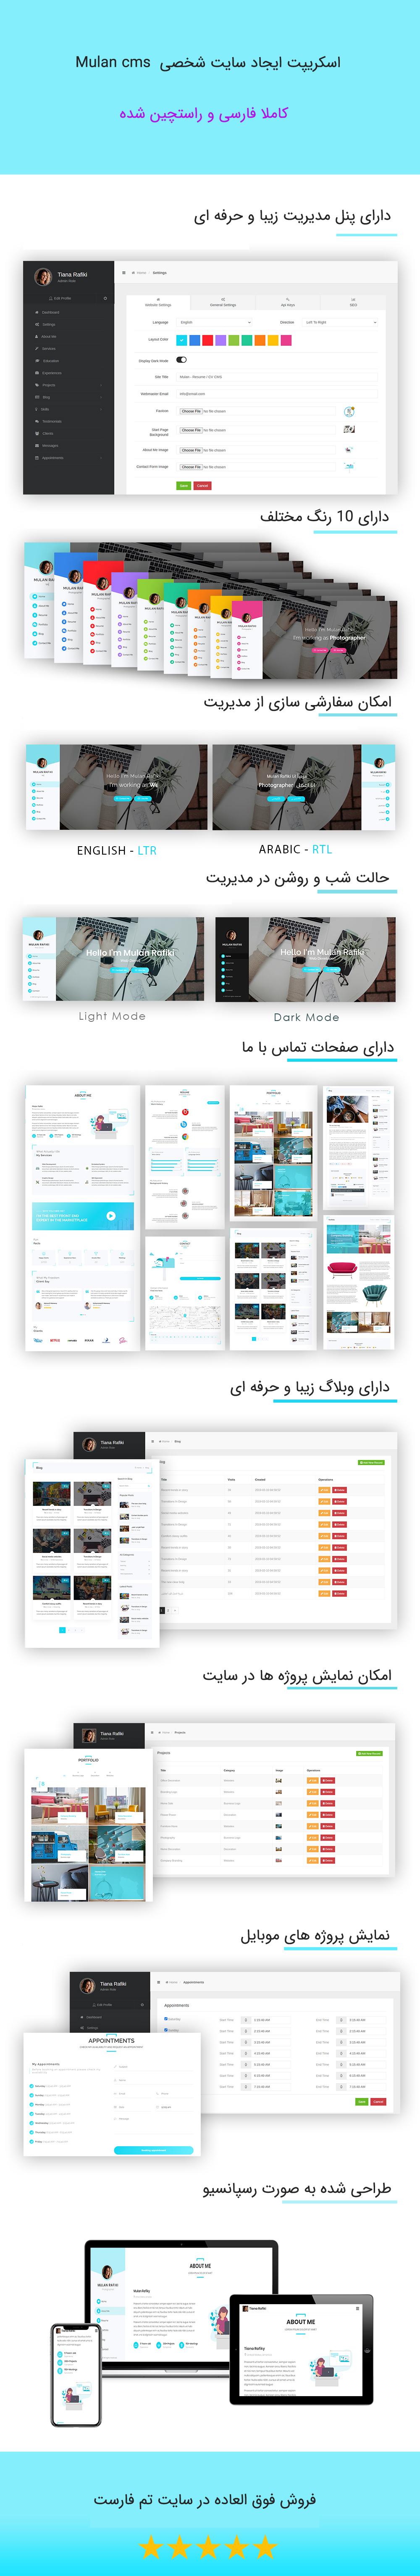 اسکریپت ایجاد سایت شخصی Mulan cms